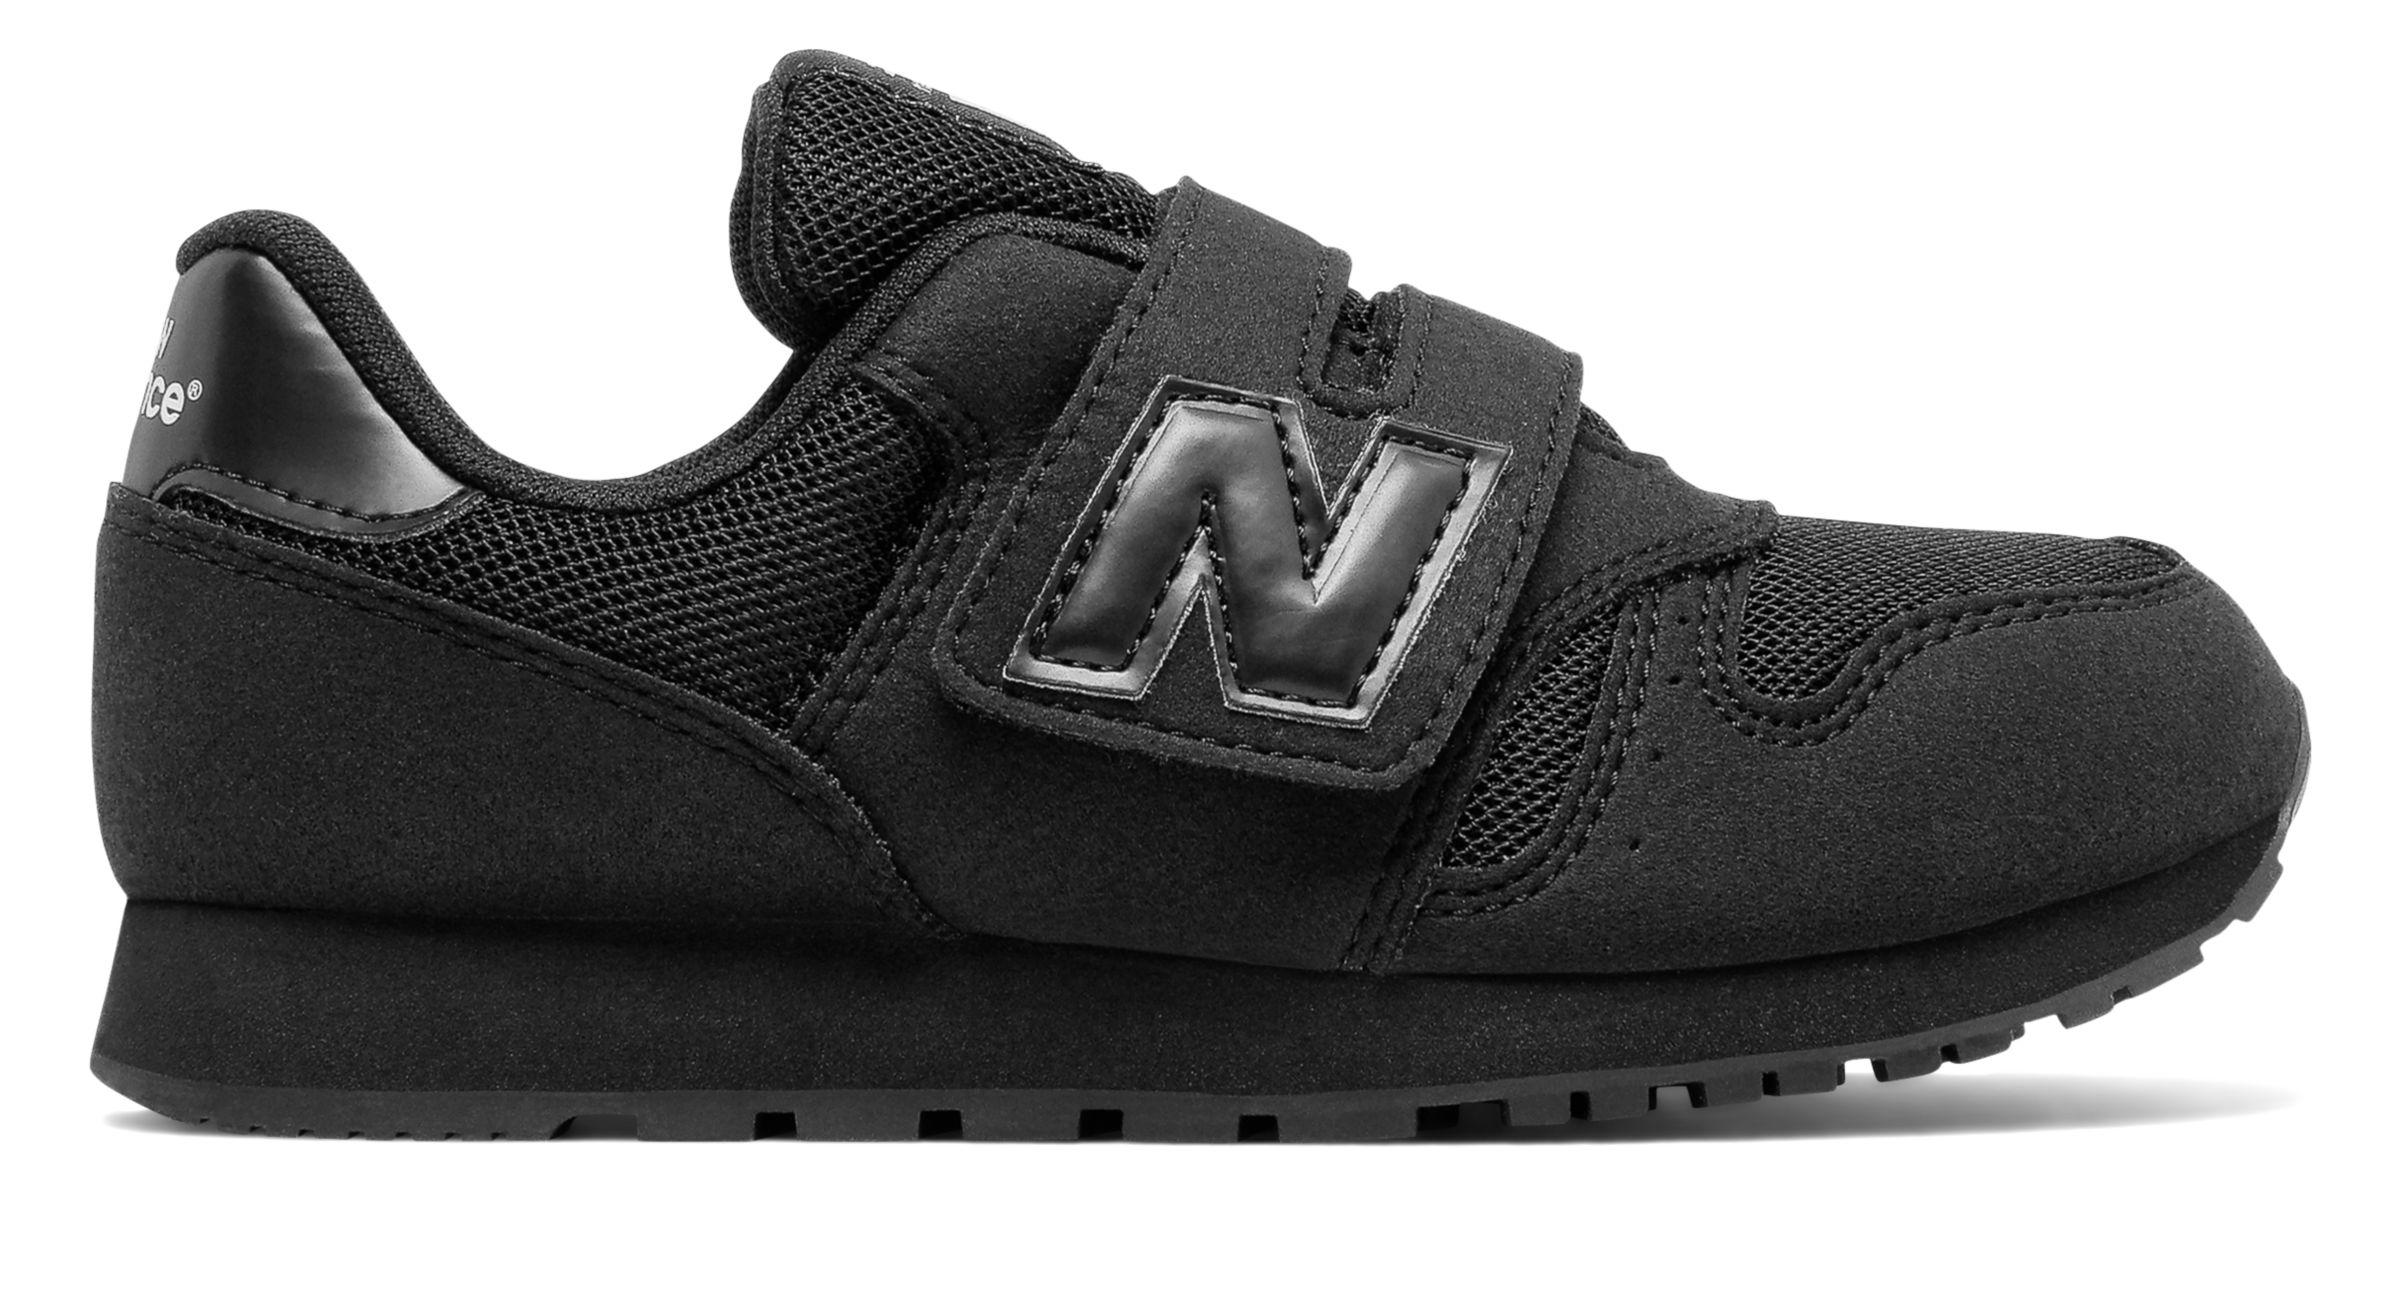 NB 373 New Balance, Black with Army Black & White